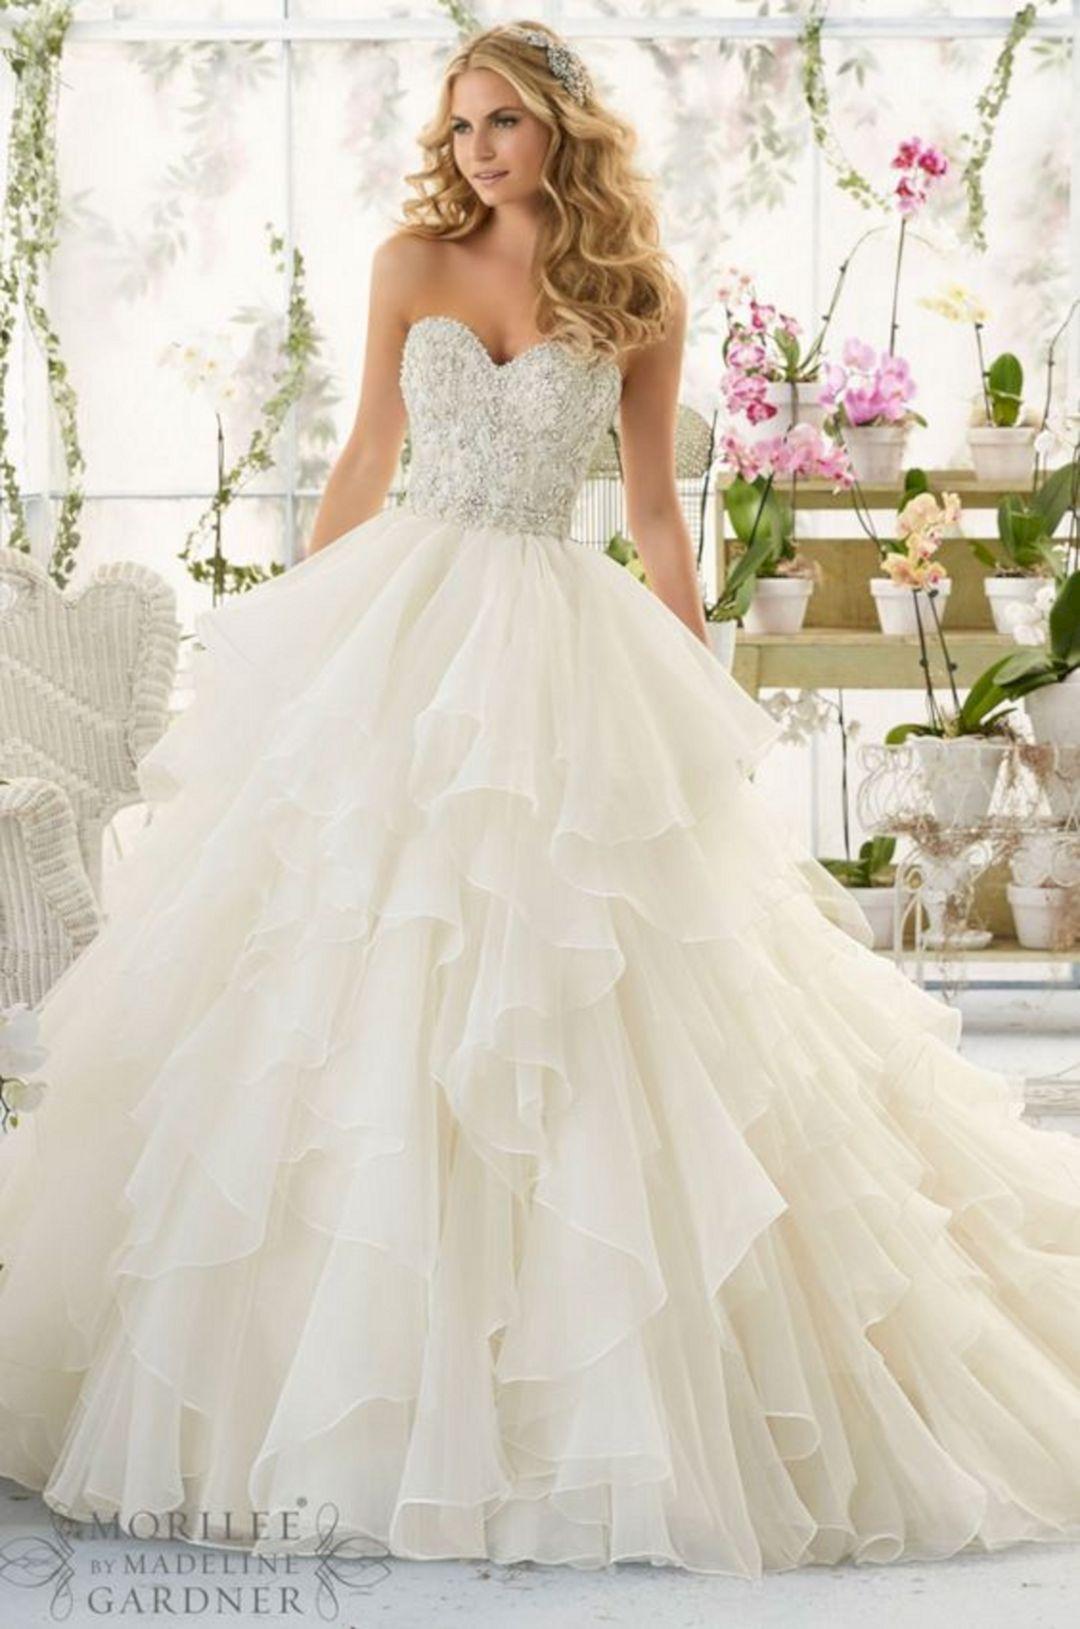 40 Beautiful Princess Wedding Dress Ideas For Perfect Bride